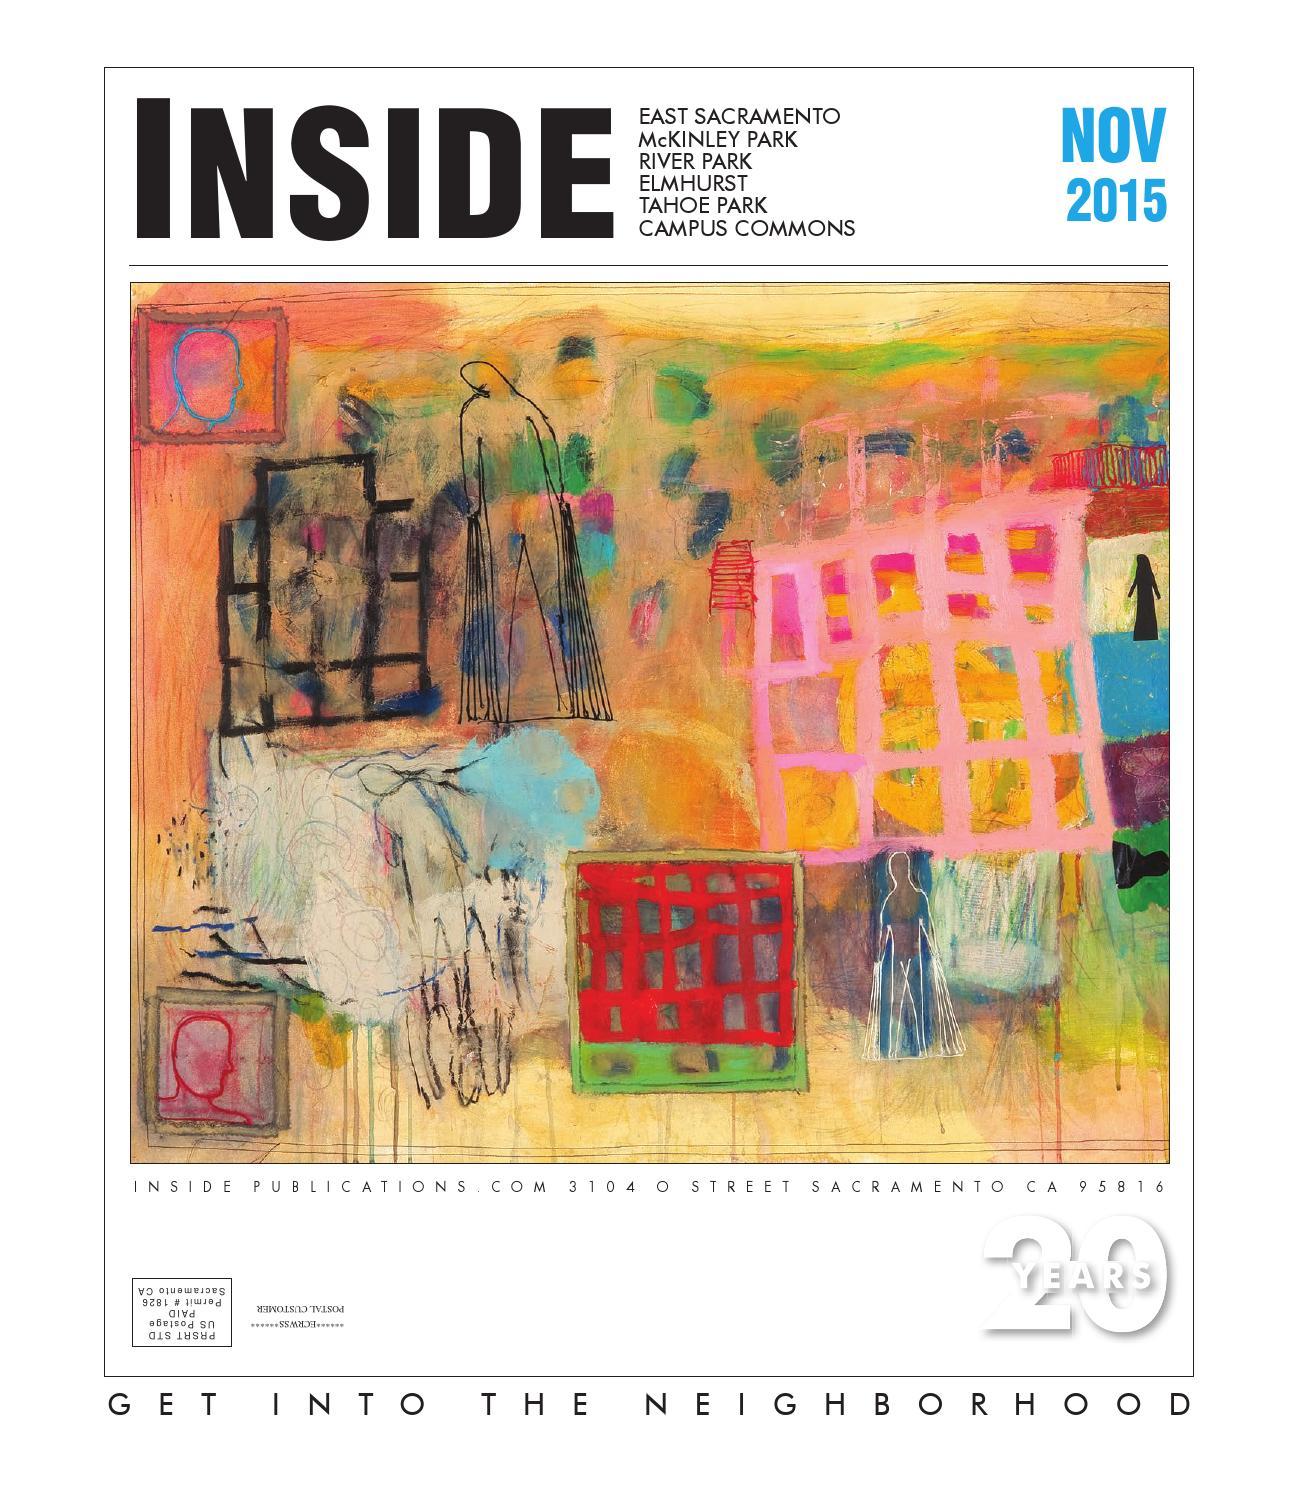 Inside East Sacramento Nov 2015 By Publications Issuu Brother 461 761 606 607 Sewing Machine Threading Diagram